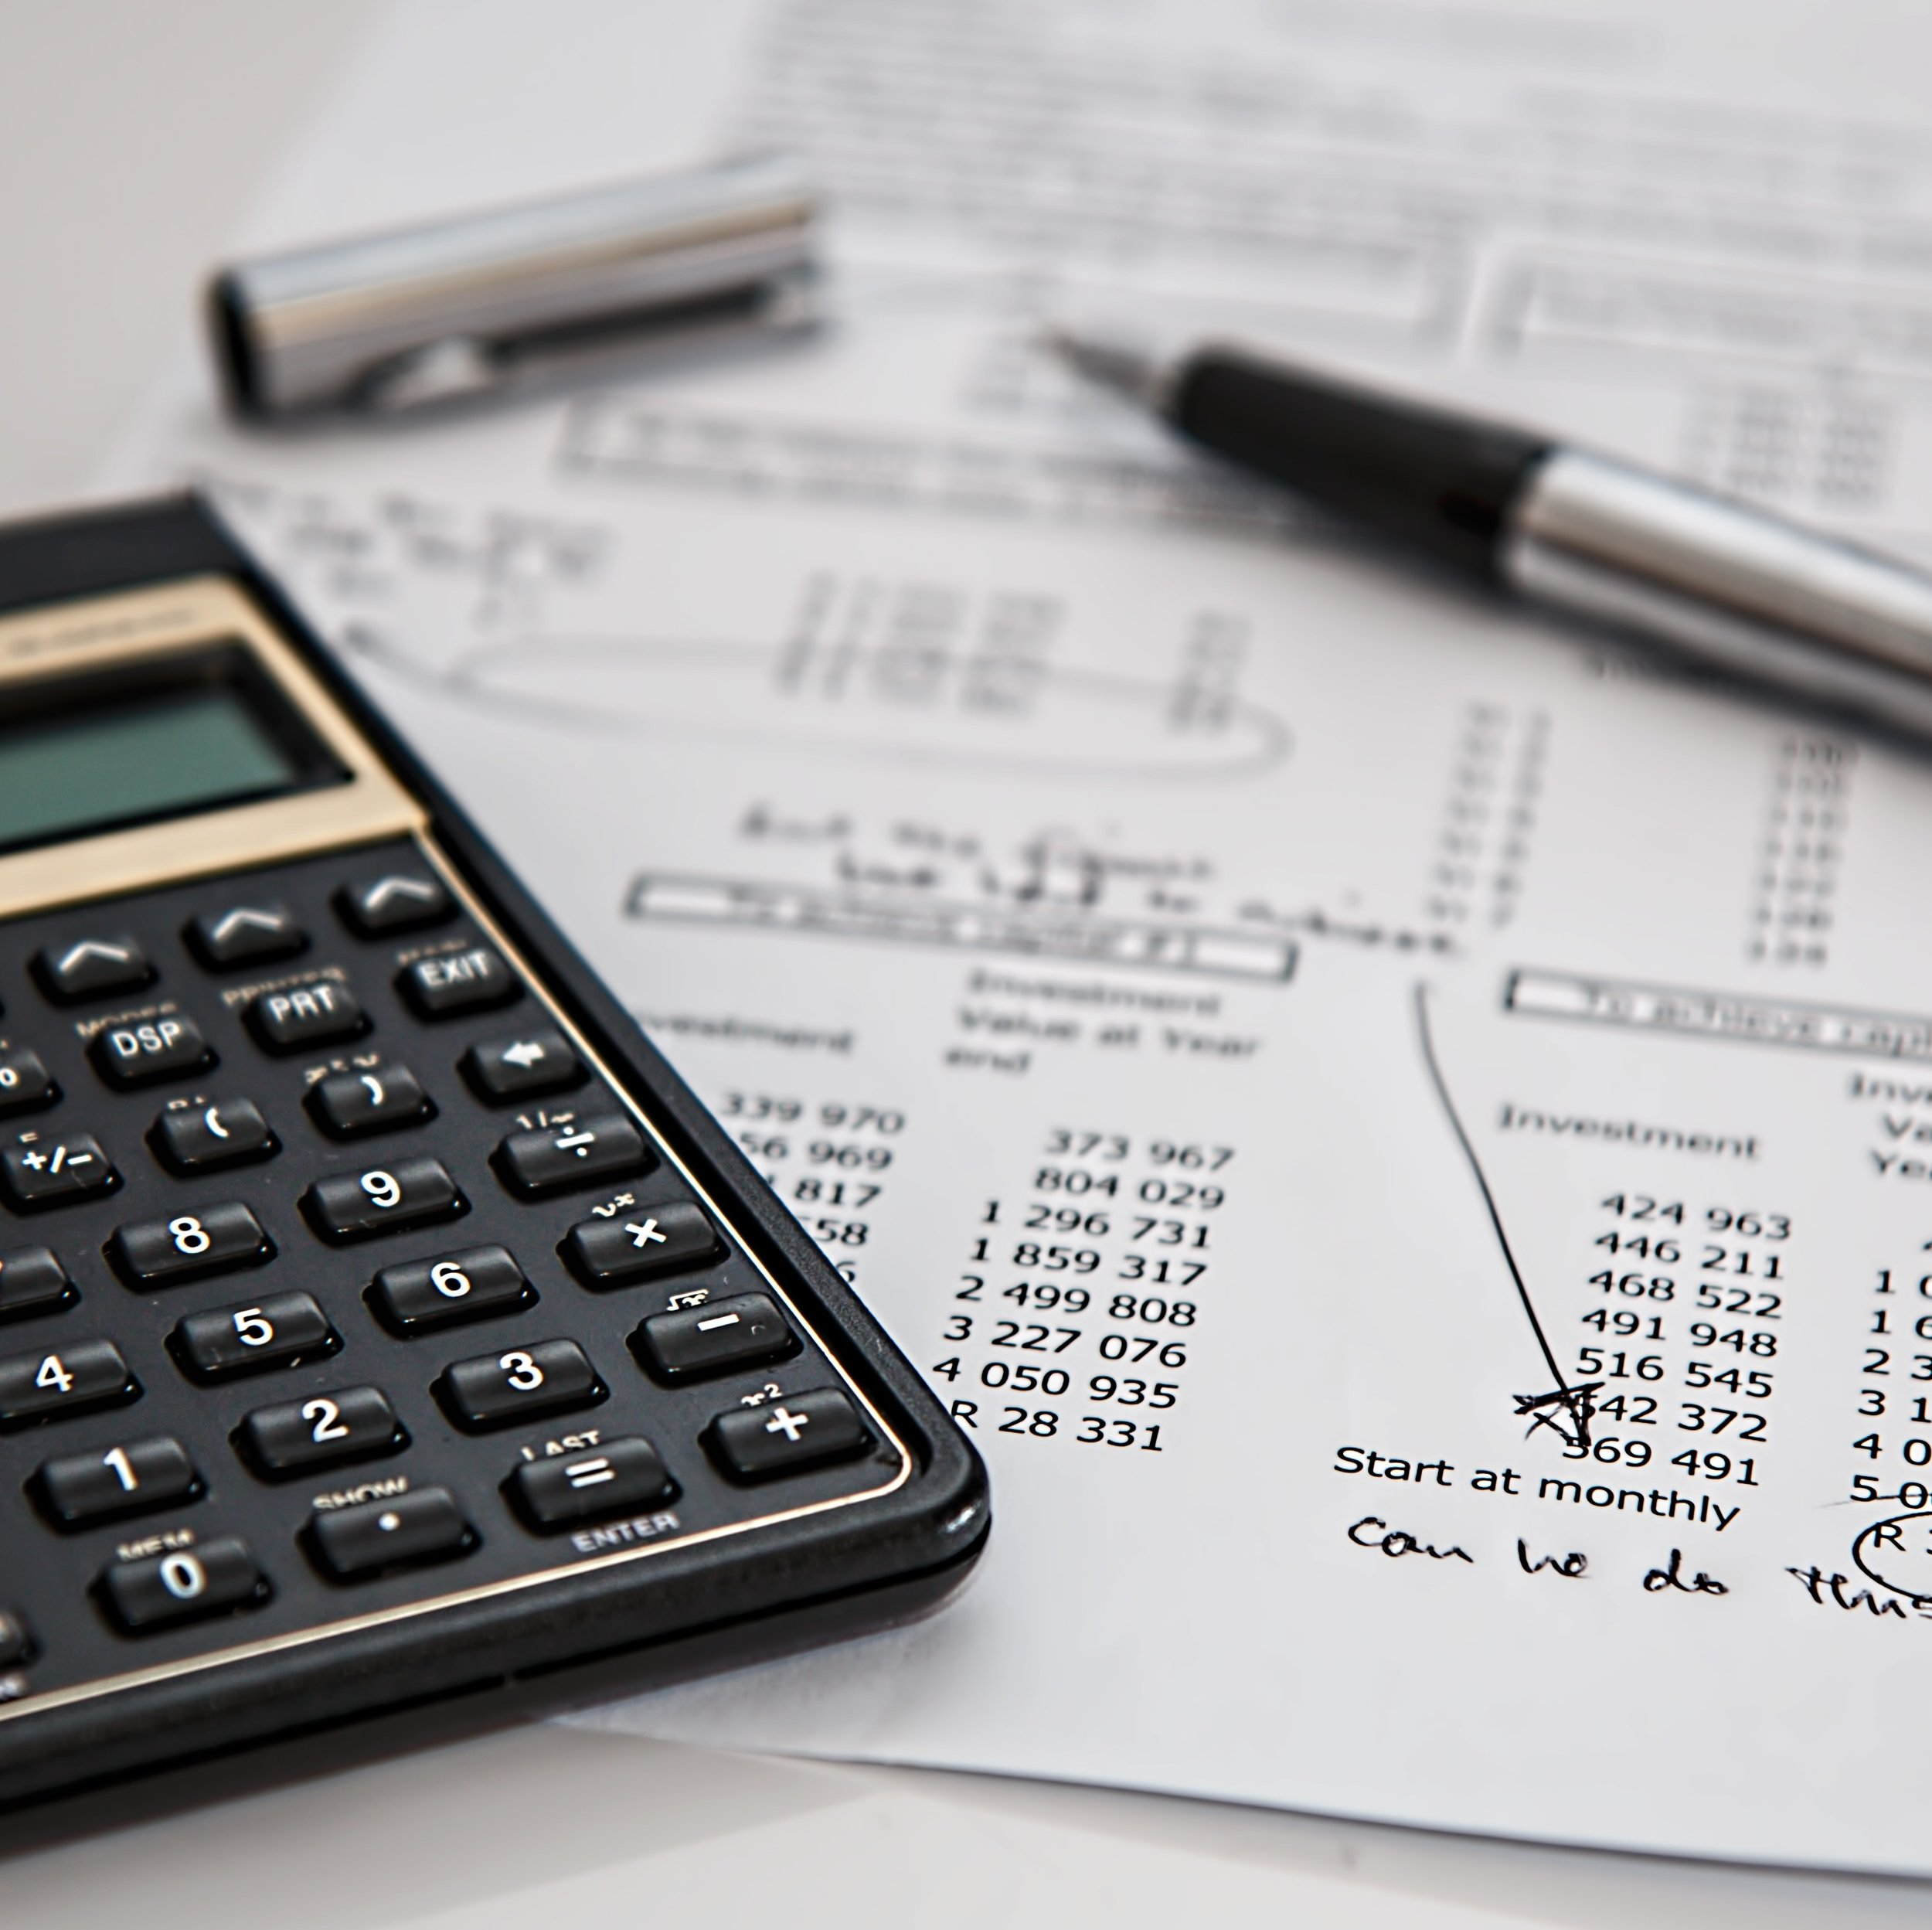 Custom Home Builders Cost & Scope